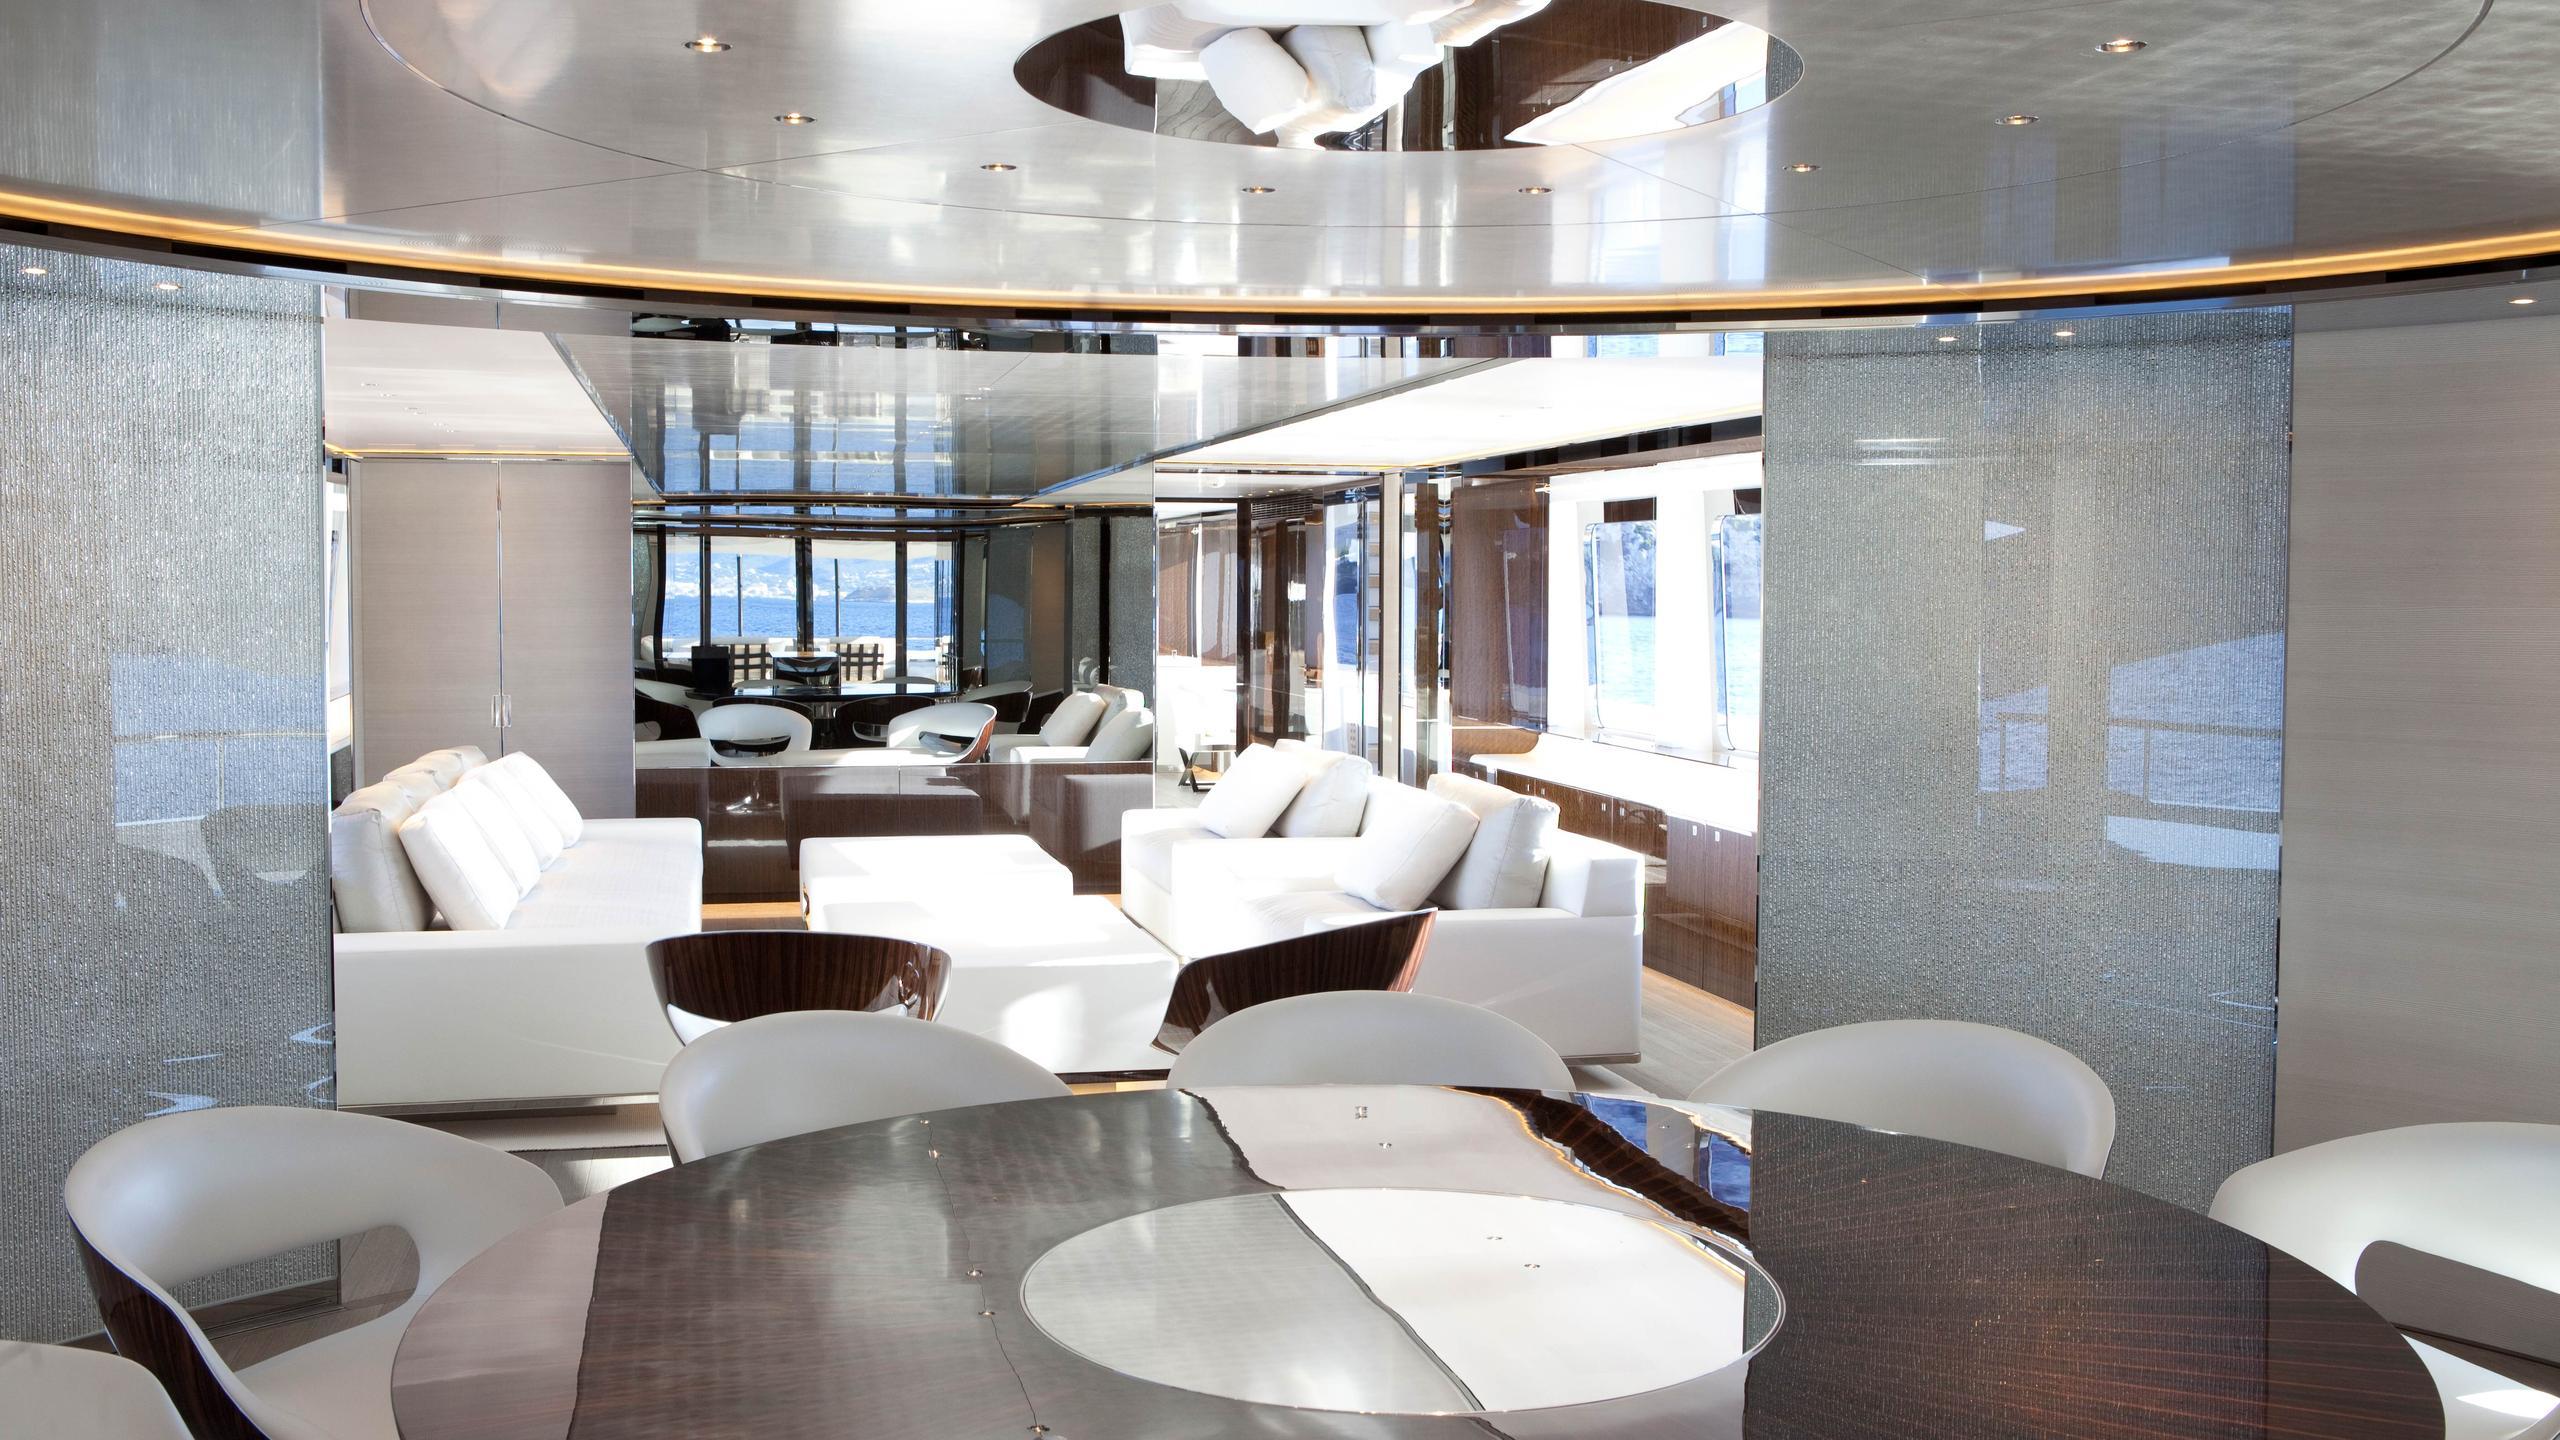 septimus-motor-yacht-heesen-2011-50m-dining-saloon